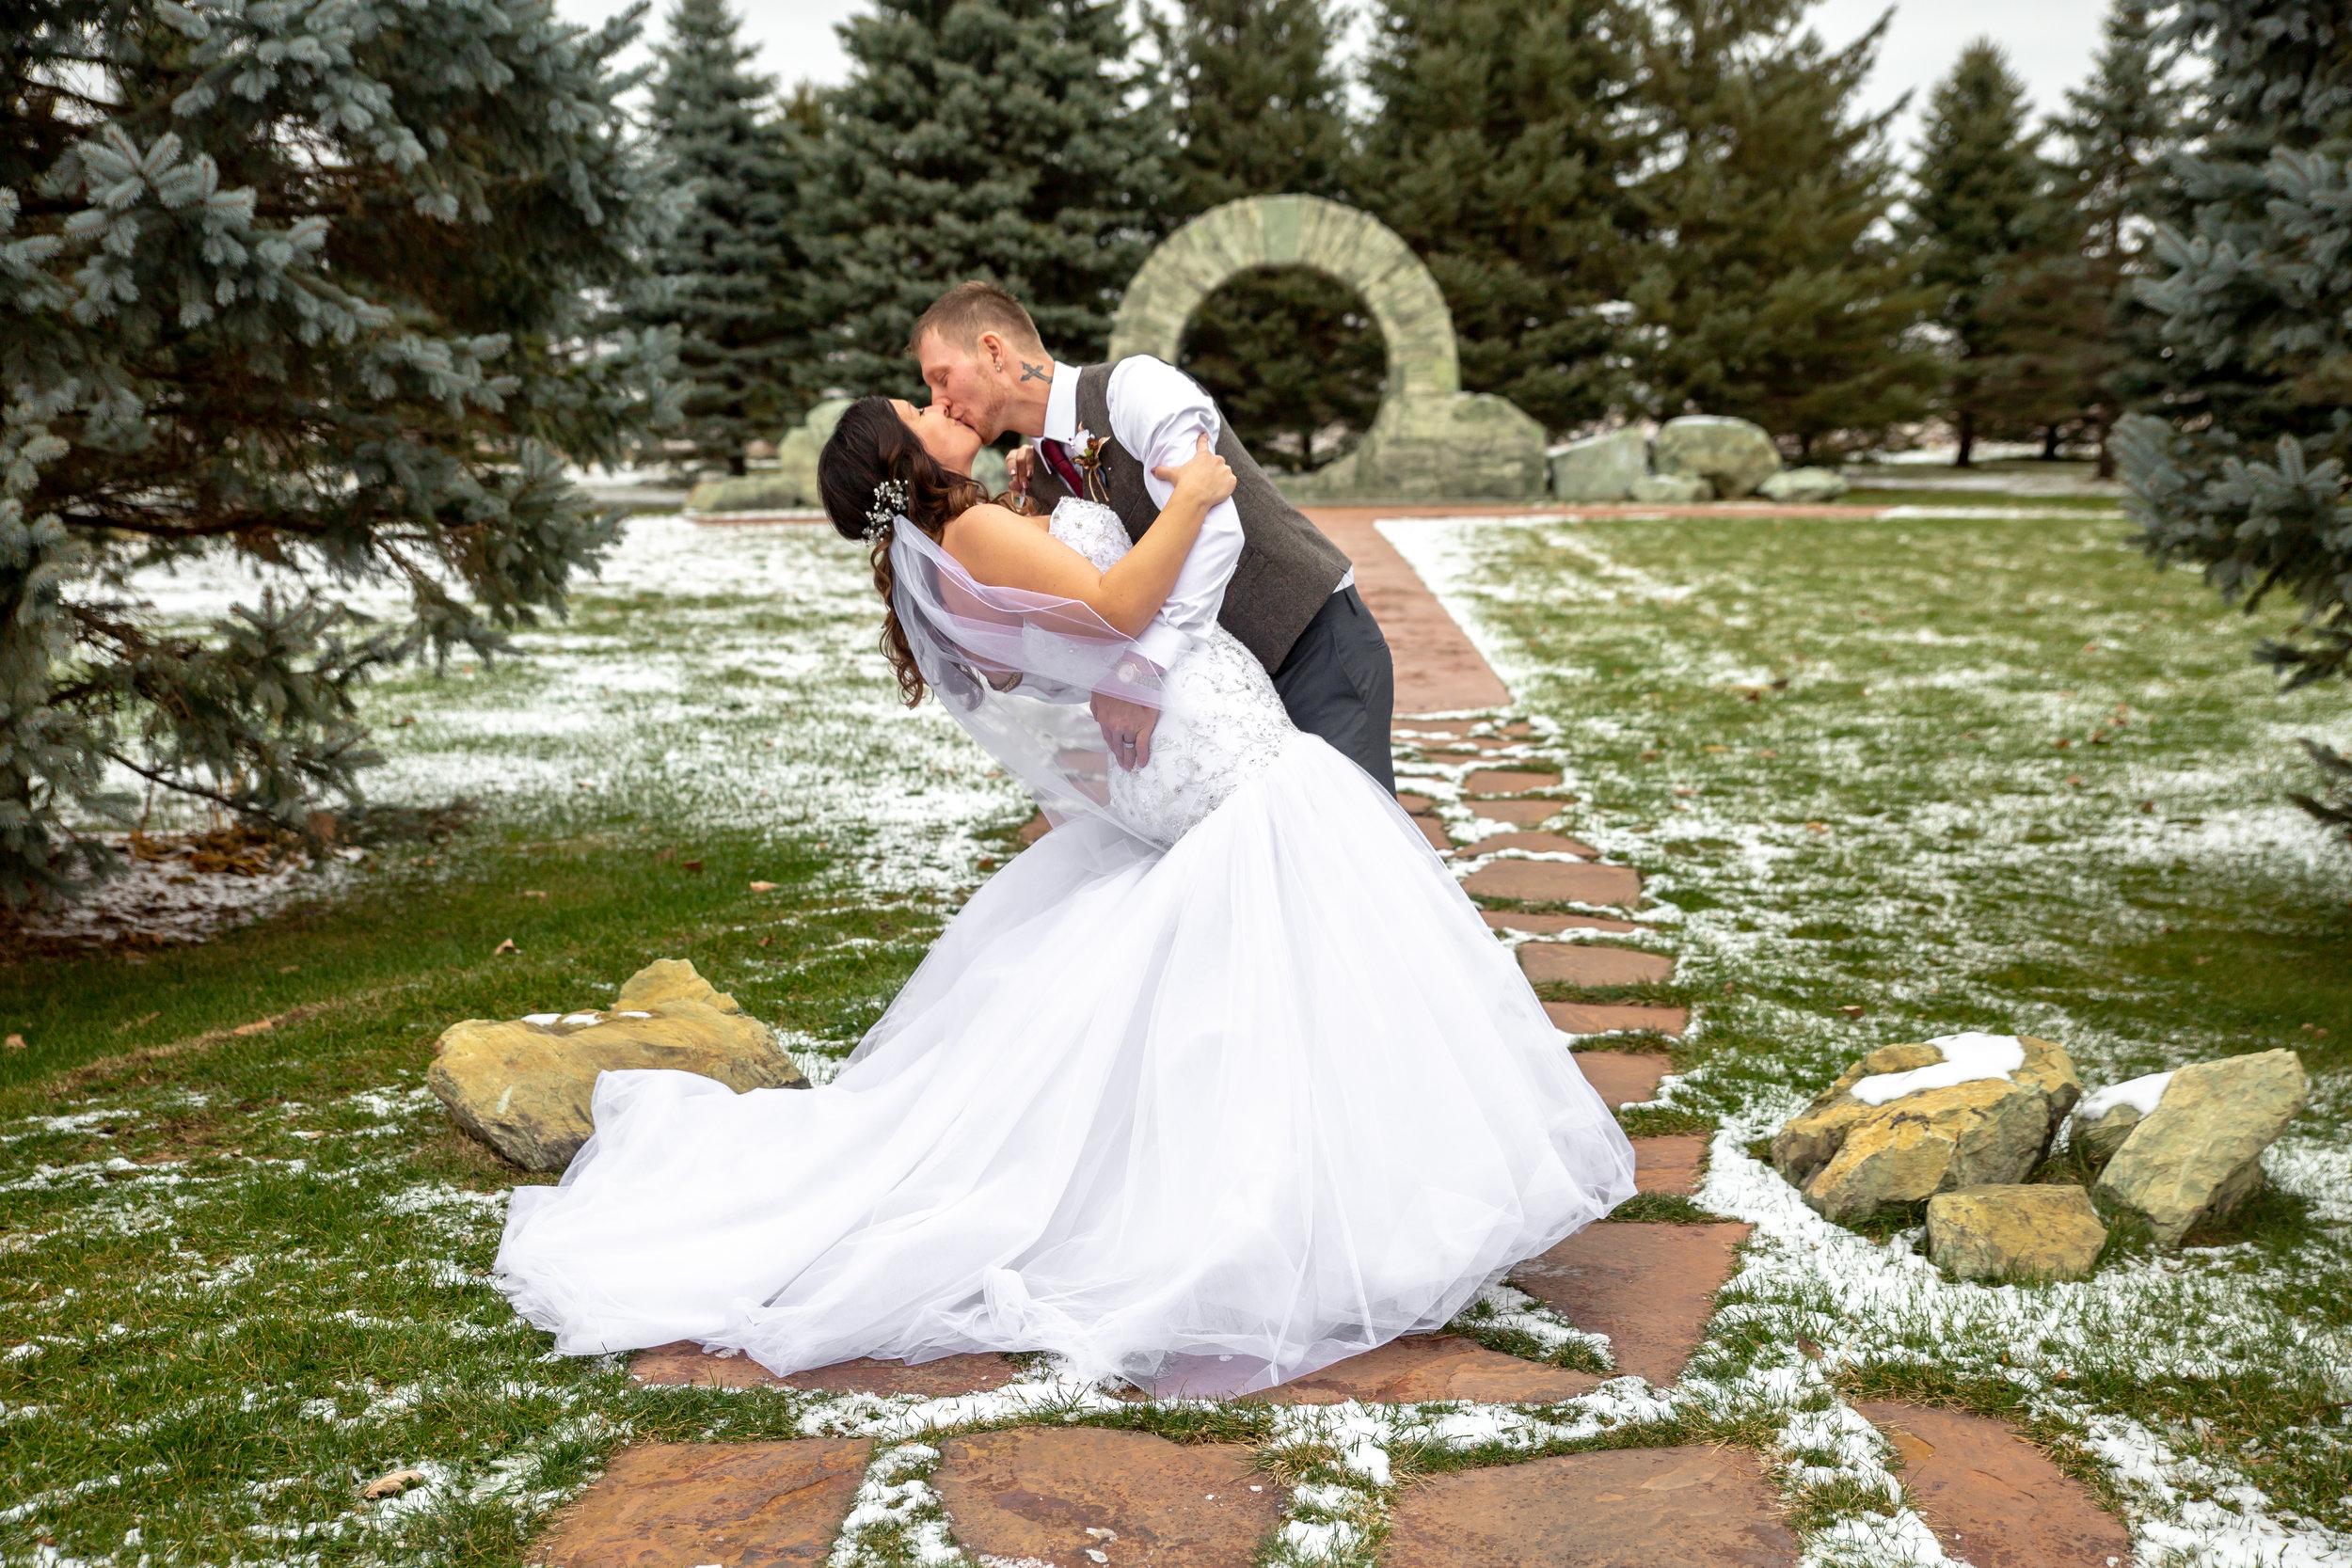 Lynne Halterman Fab Weddings photographer, dip picture Minnesota wedding venue